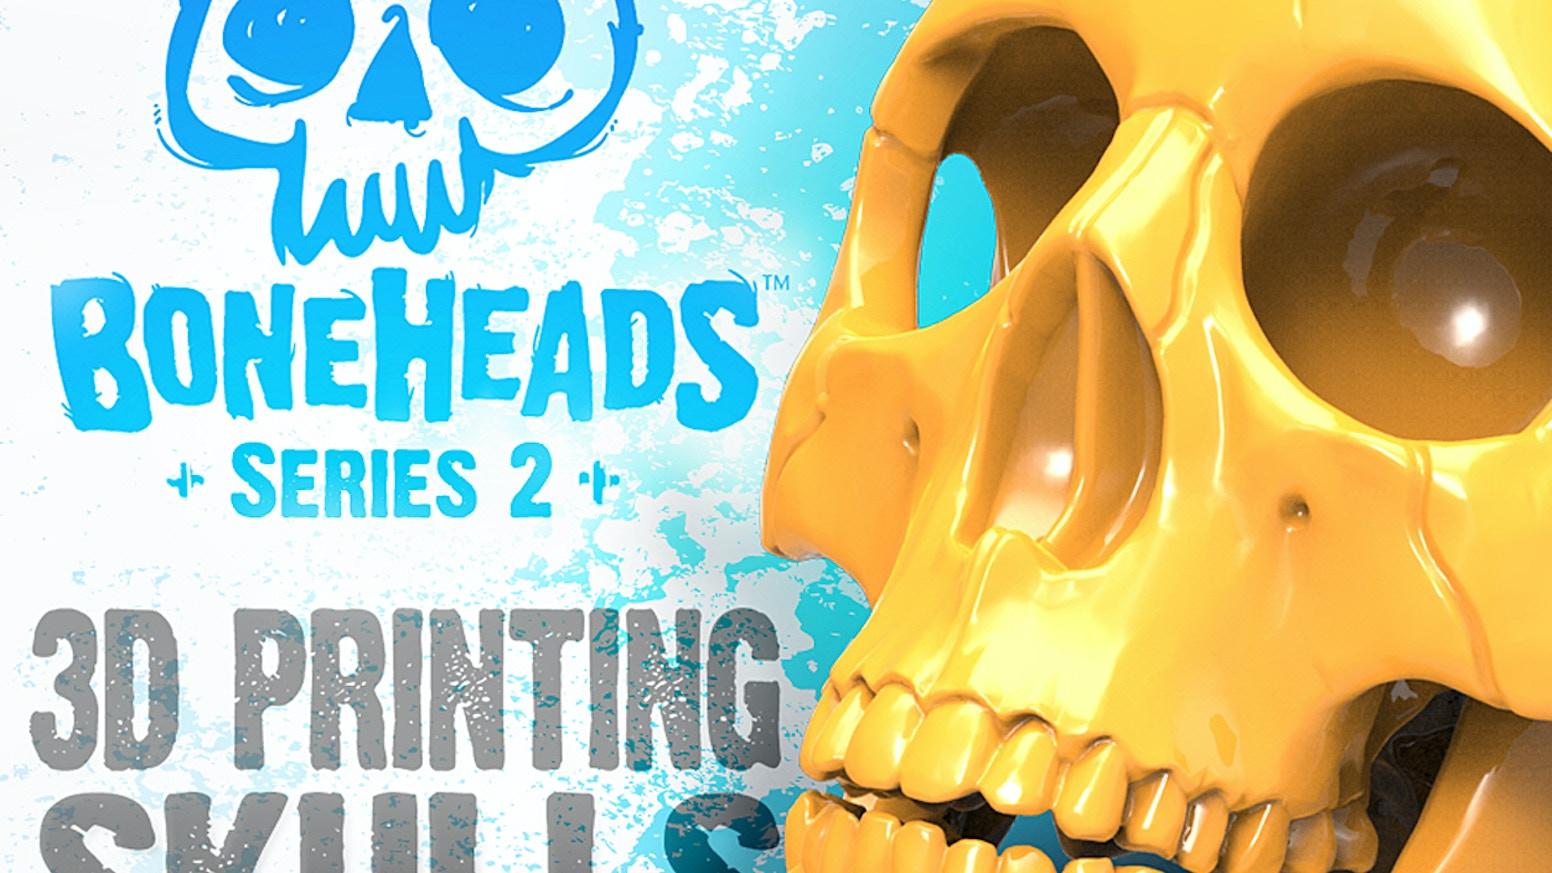 3D Printer Skull Kits: Boneheads Series 2 via 3DKitbash com by